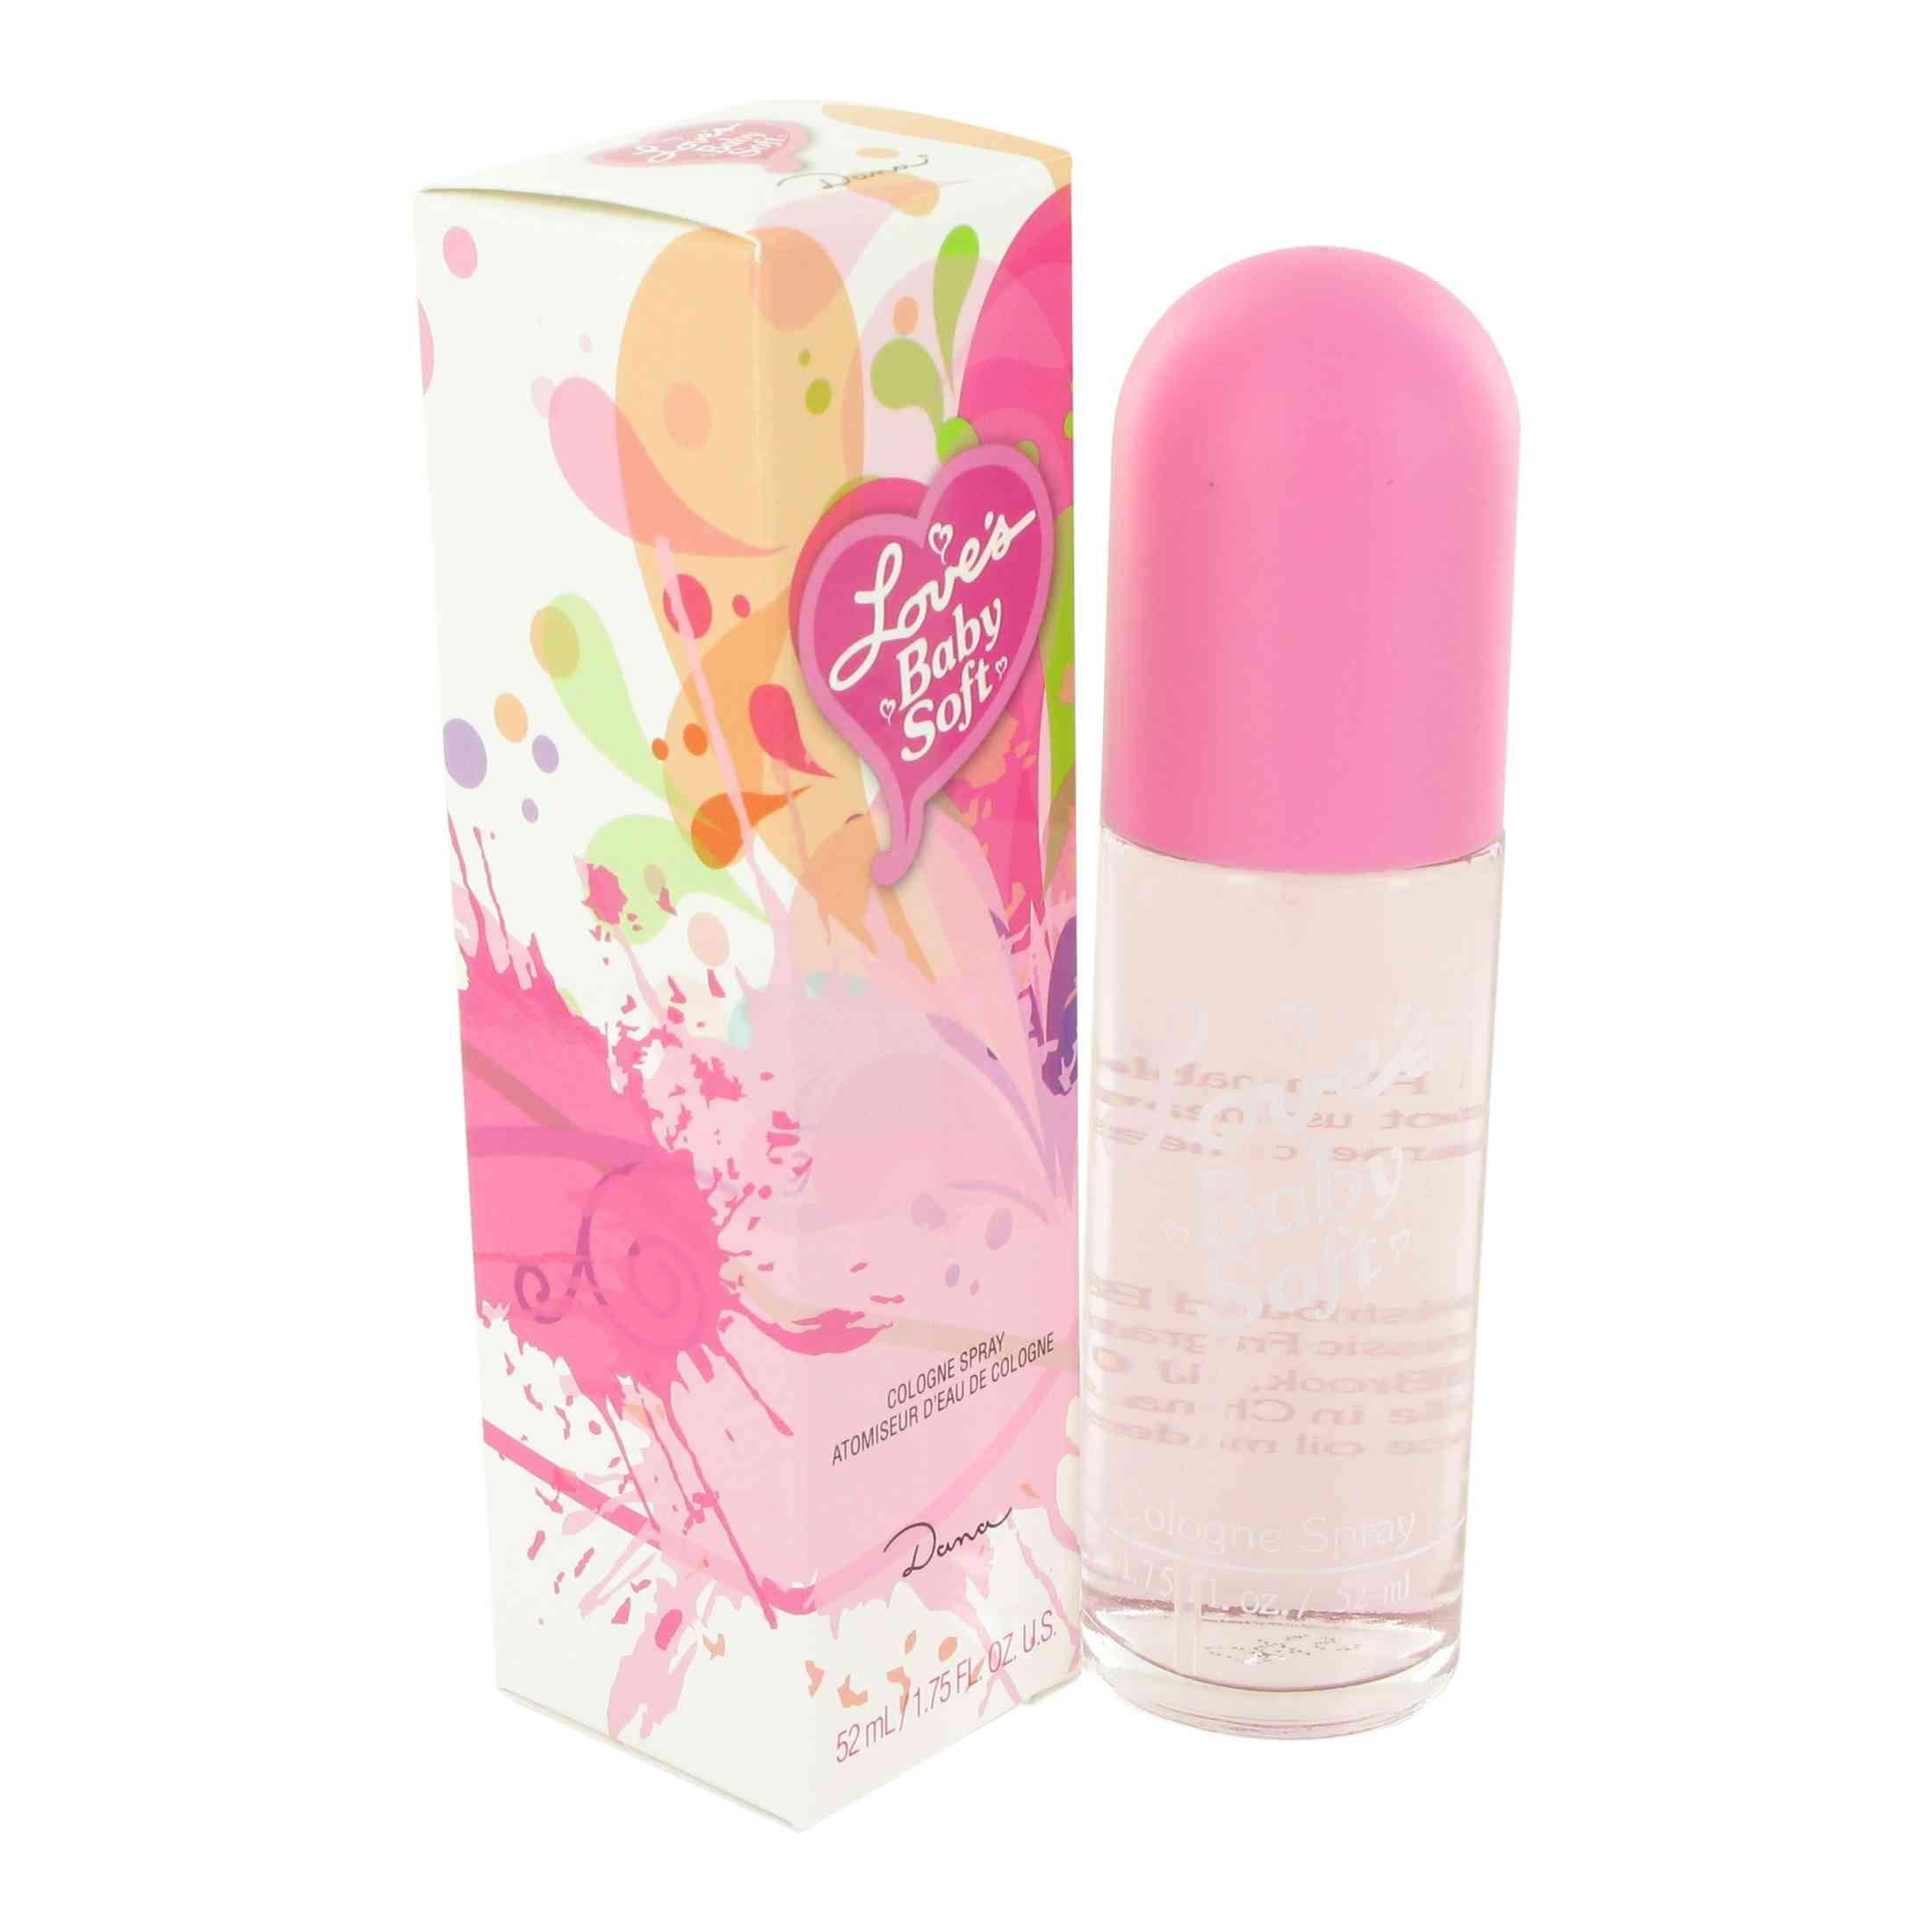 Dana Love's Baby Soft аромат для женщин